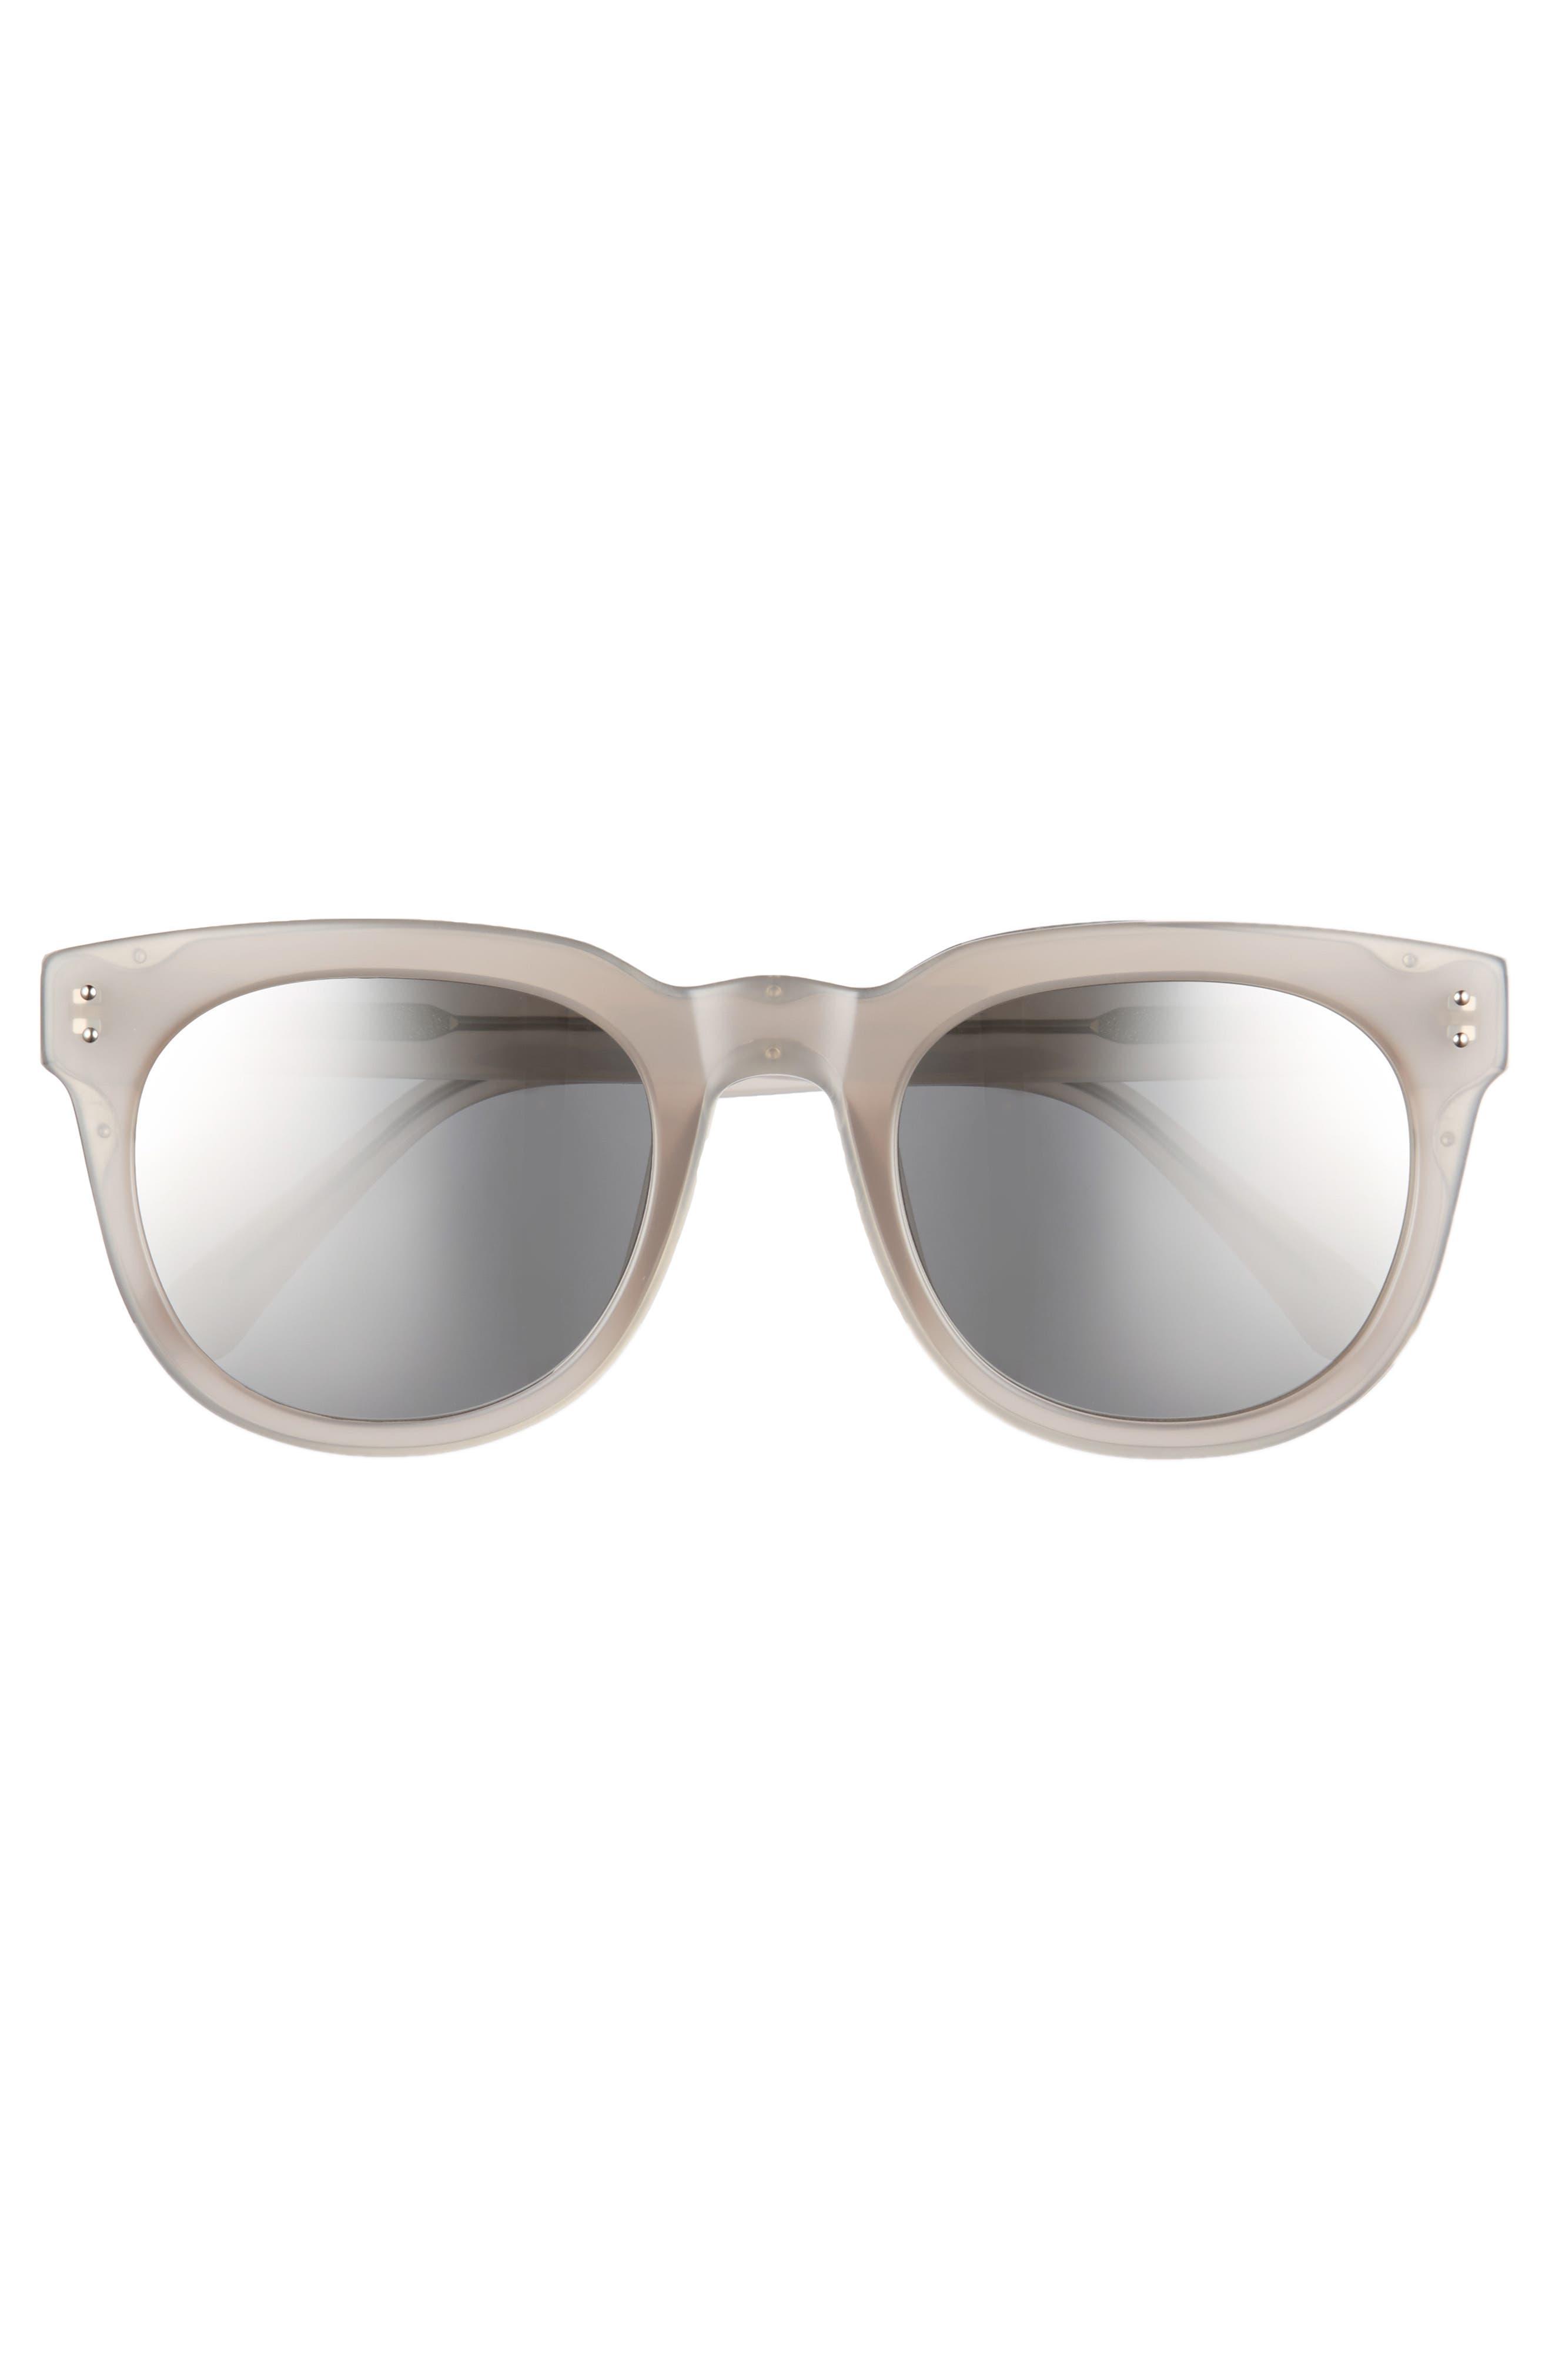 50mm D-Frame Mirrored Sunglasses,                             Alternate thumbnail 3, color,                             020